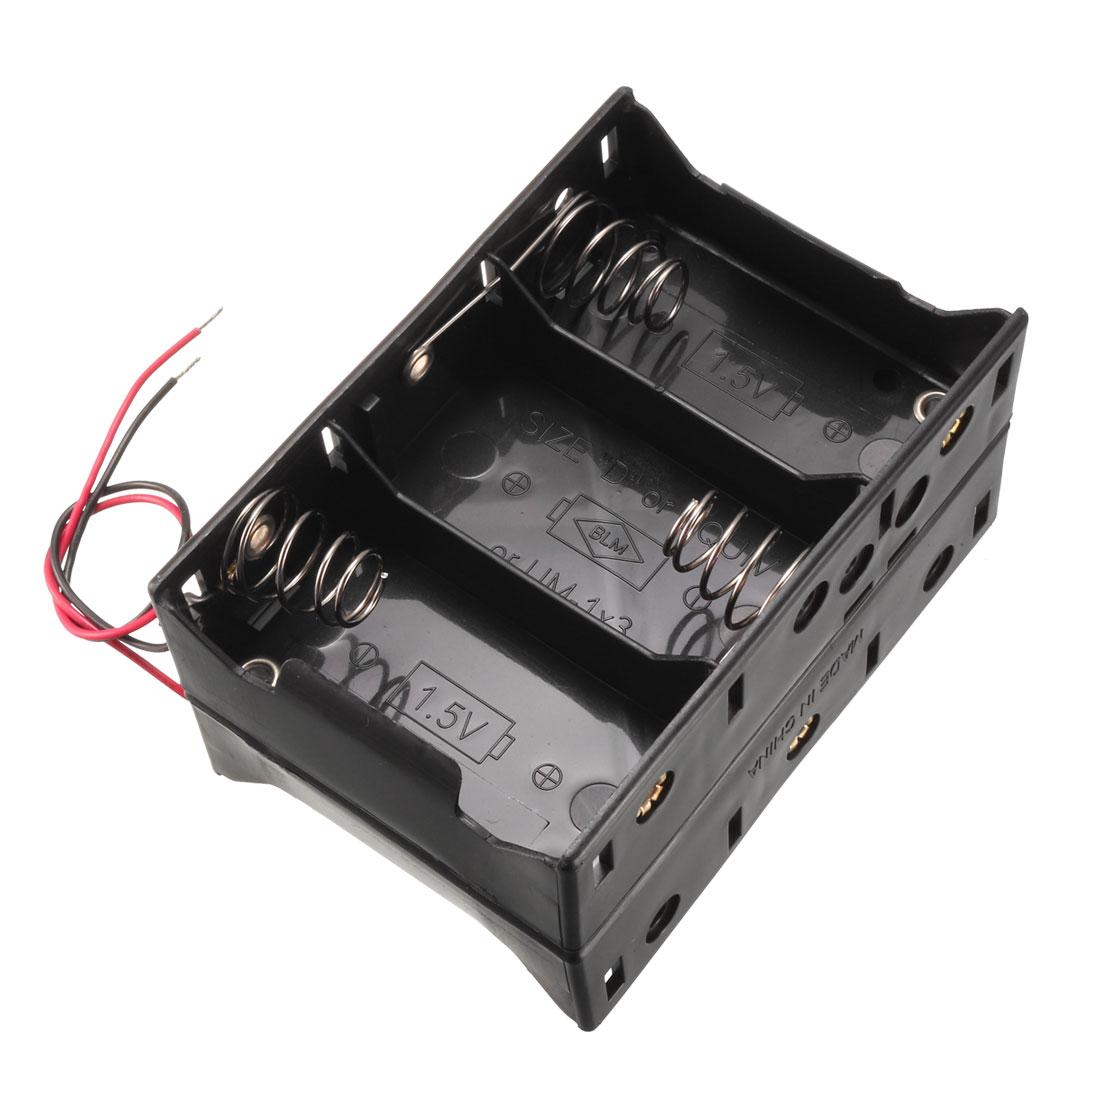 Black Plastics 2 Wires Two Layers 6 x 1.5V D Batteries Holder Case